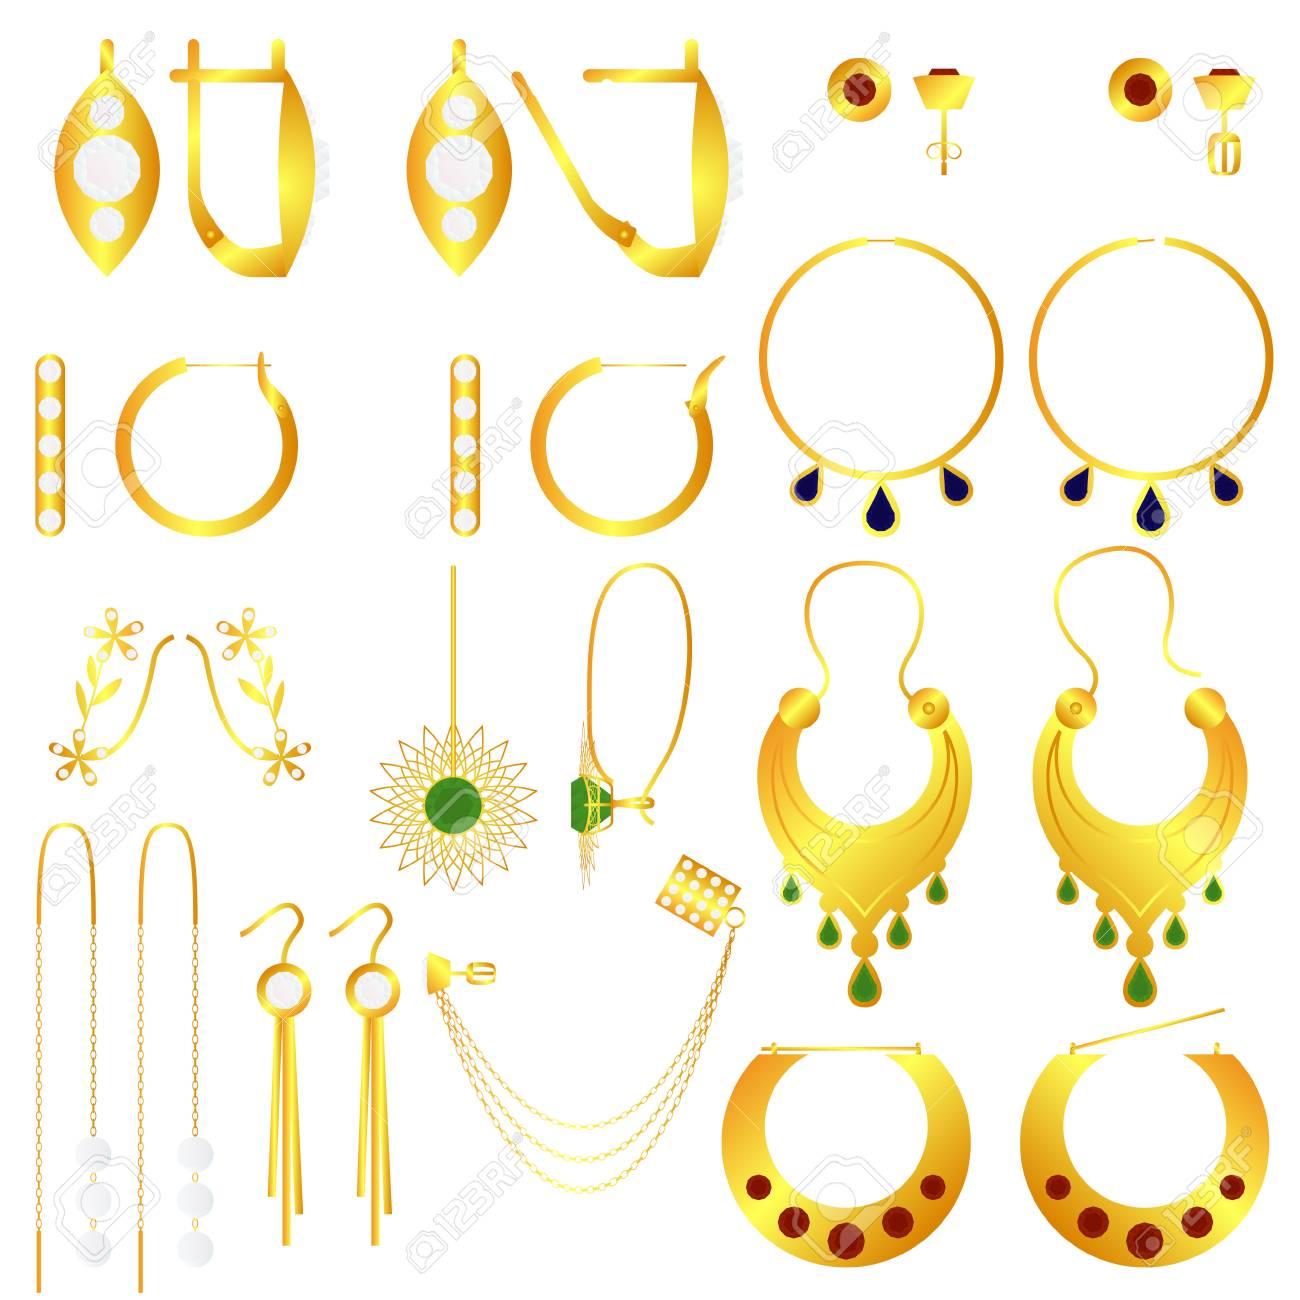 Earring Clasp Types Golden Earrings Vector Set Royalty Free ...